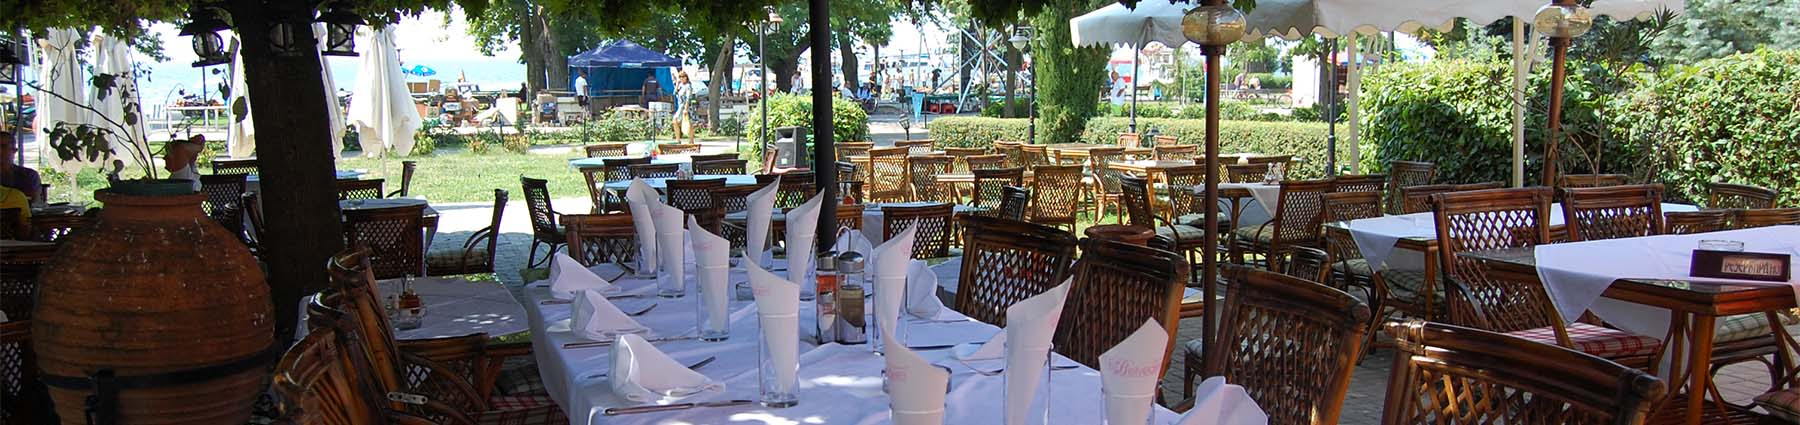 Ресторан Белведере